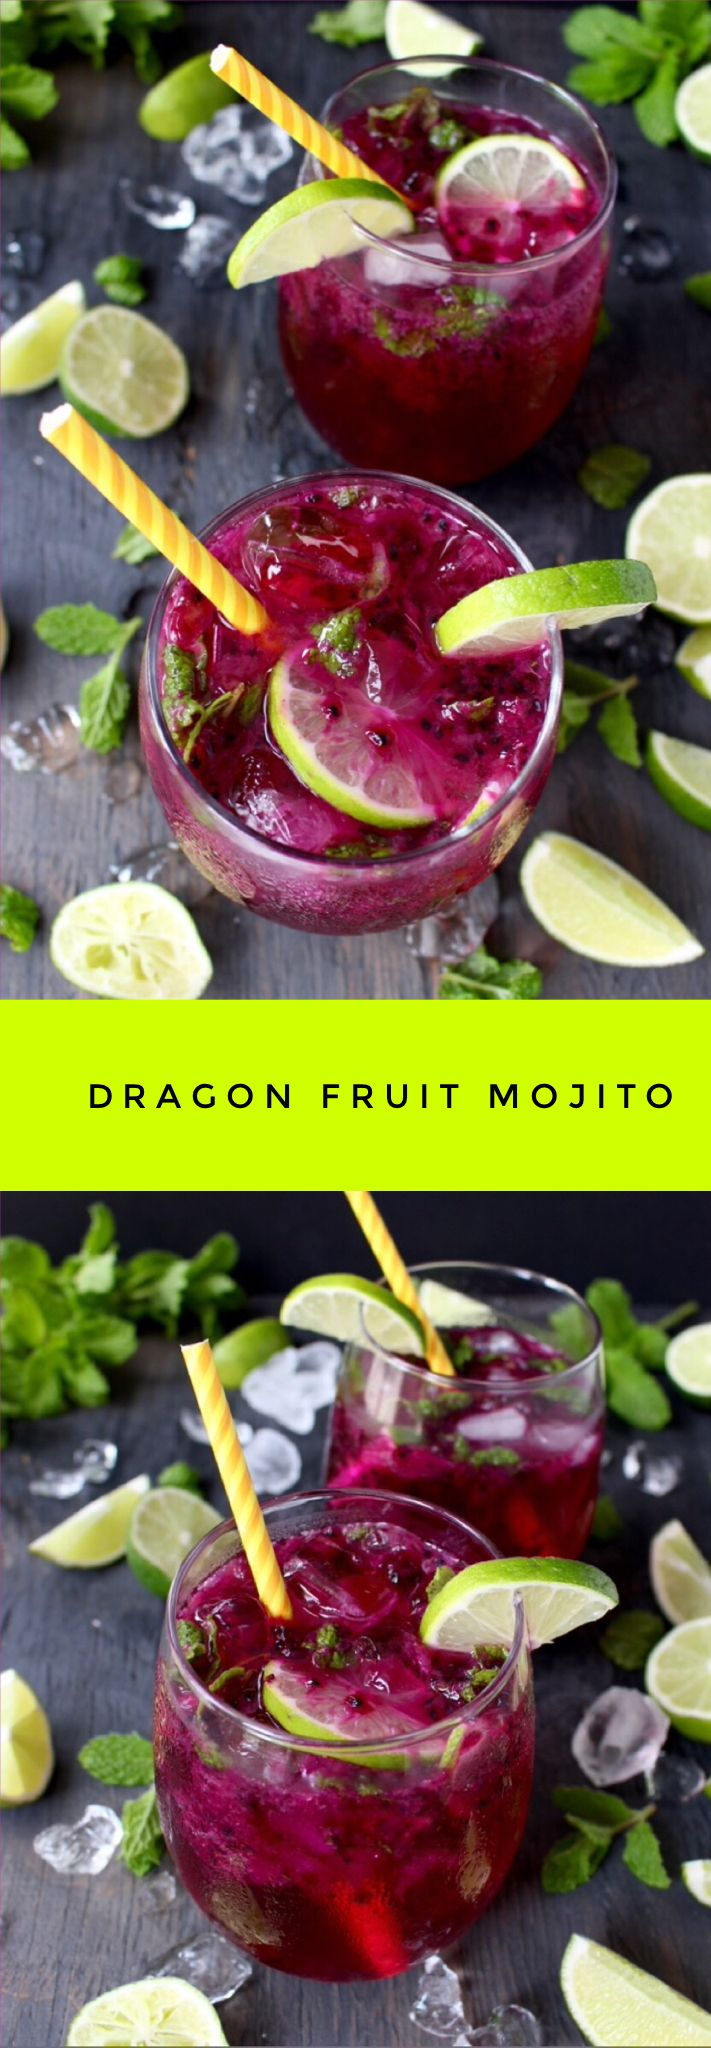 Dragon Fruit Juice Mojito | CiaoFlorentina.com